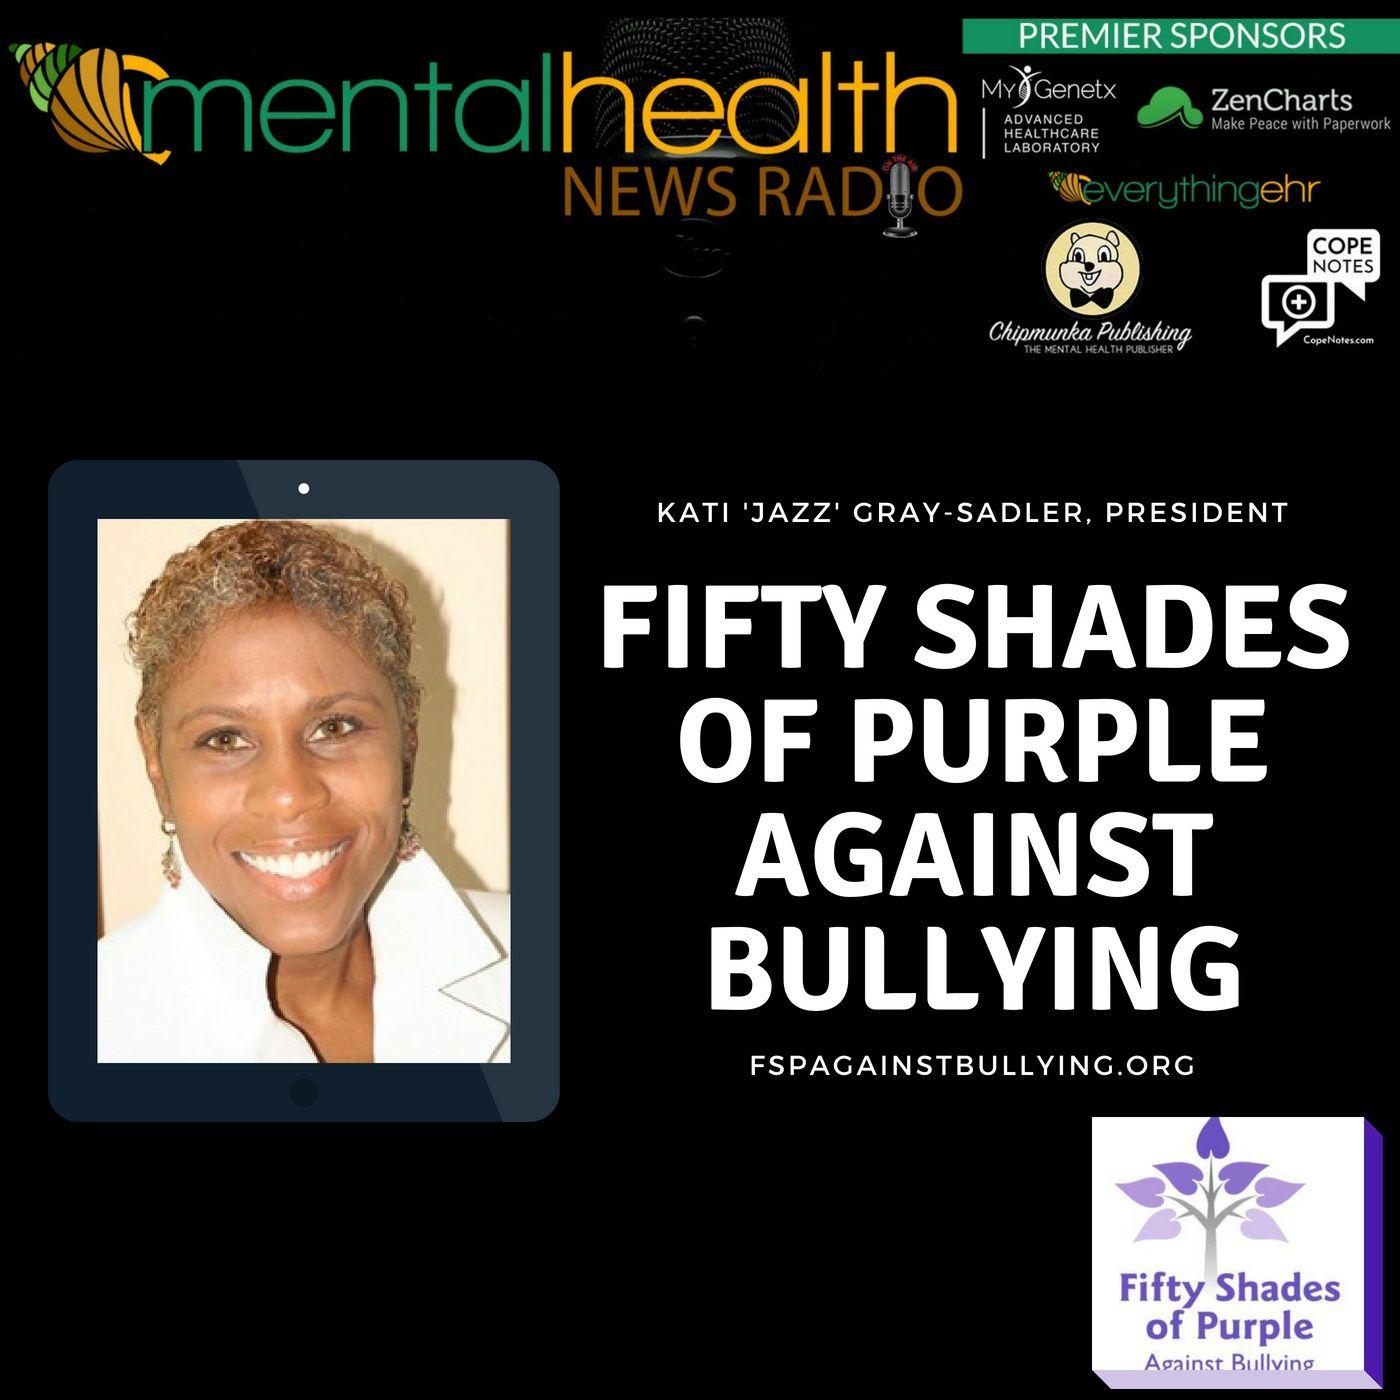 Mental Health News Radio - Fifty Shades of Purple Against Bullying with President Kati 'Jazz' Gray-Sadler